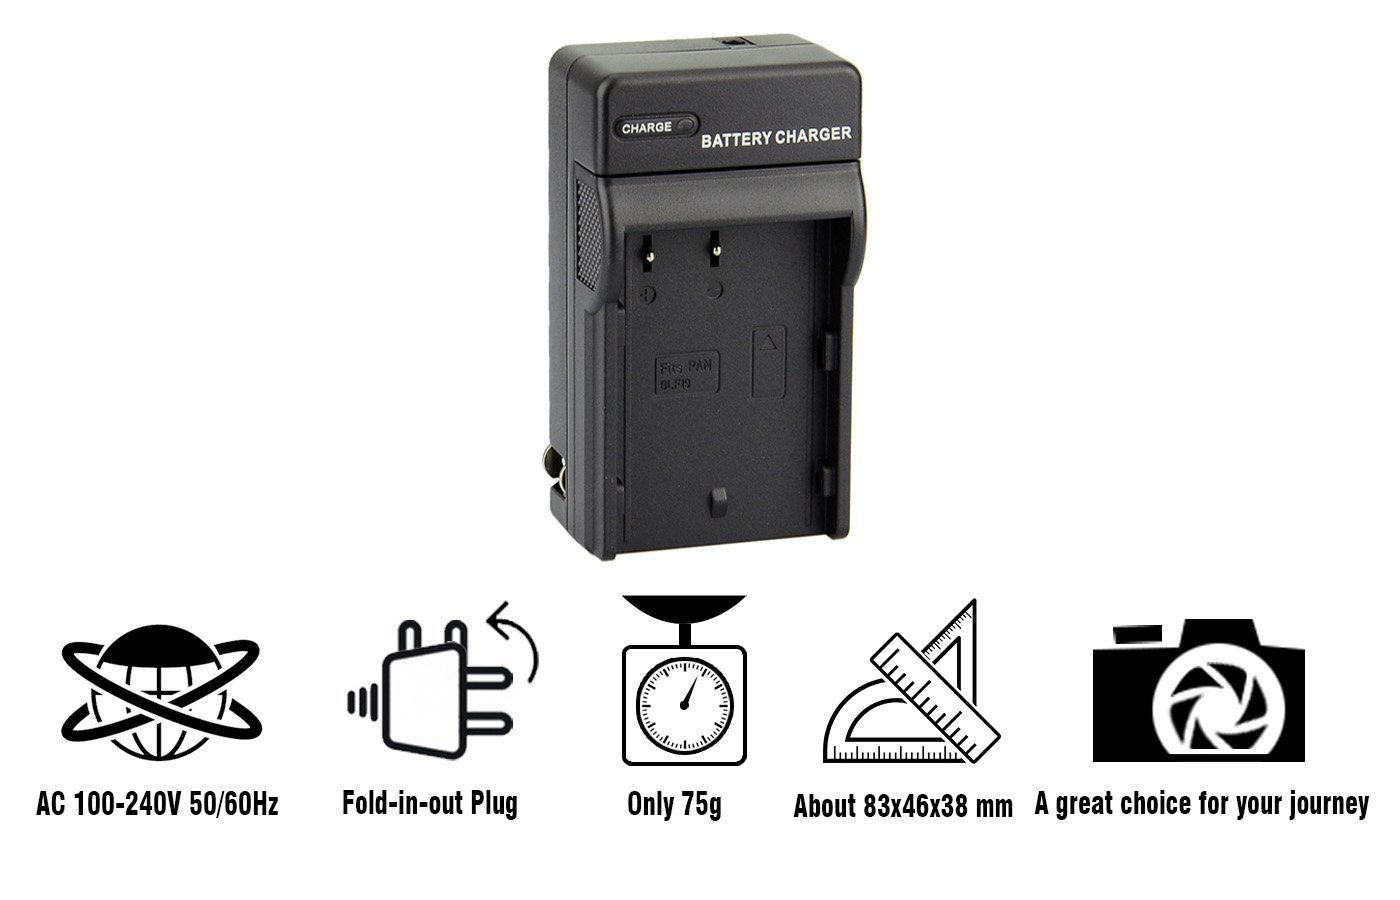 Dste Dmw Blf19 Blf19e Dc141 Travel Charger Kit For Wasabi Battery Panasonic Gh3 Gh4 Gh5 Lumix Dmc Dc G9gk K G9 Digital Camera As Btc10